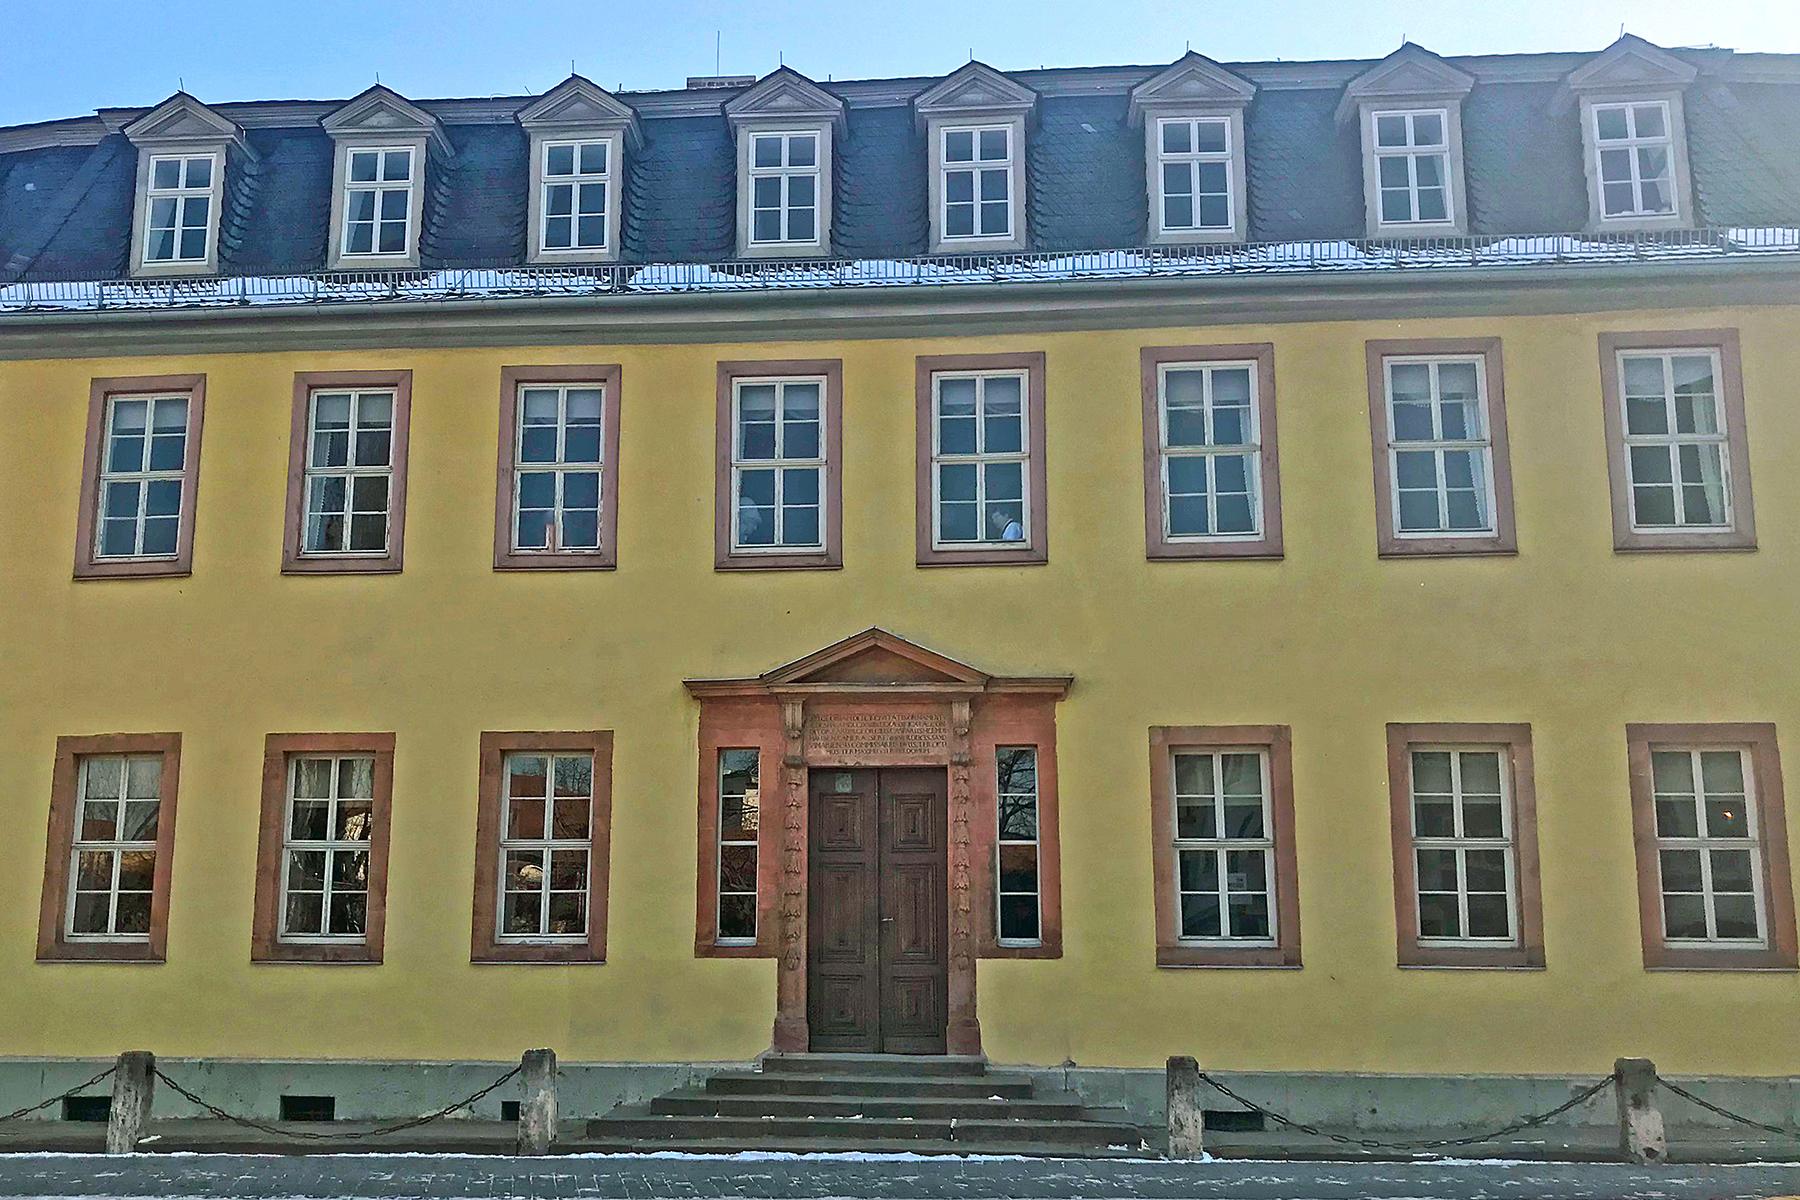 Goethe in Weimar: 9 Orte in Weimar, wo man Johann Wolfgang von Goethe begegnet